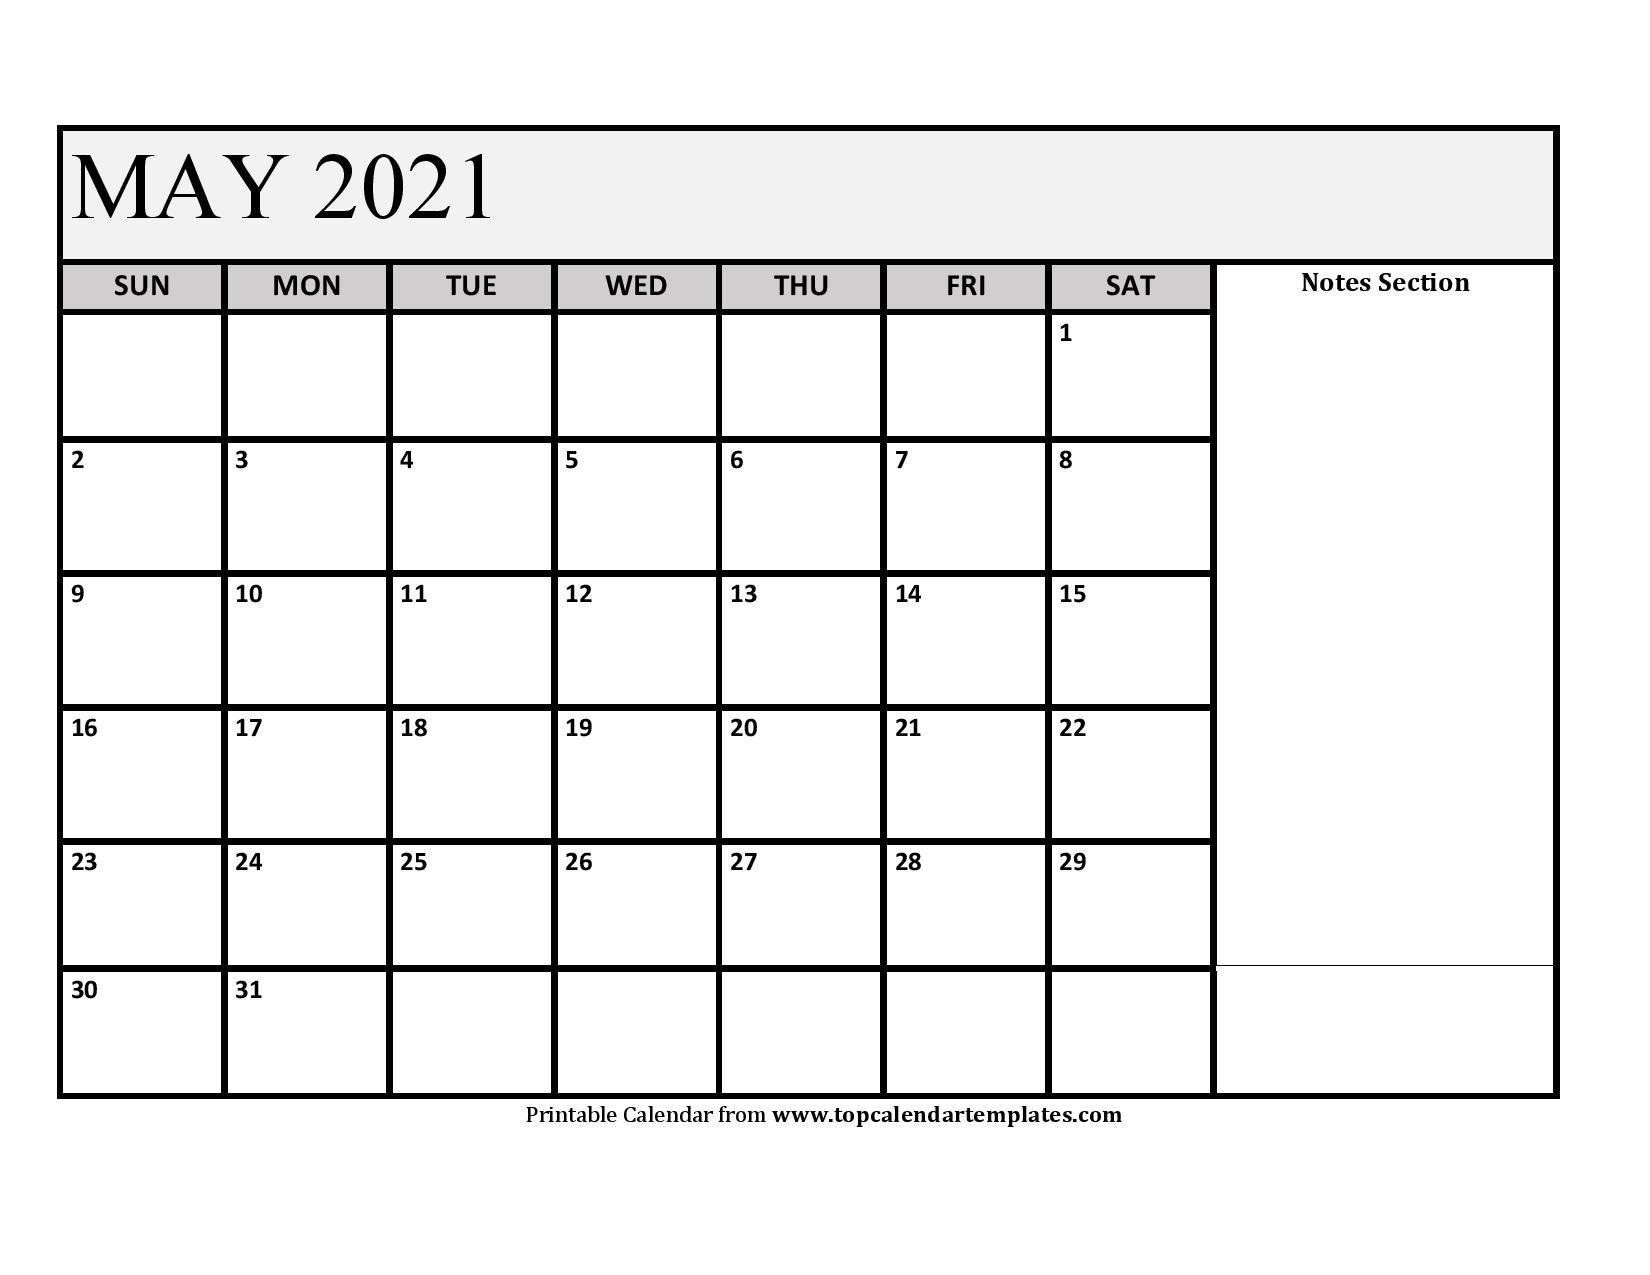 Printable May 2021 Calendar Template - Pdf, Word, Excel for Printable Interactive 2021 Calendar Graphics